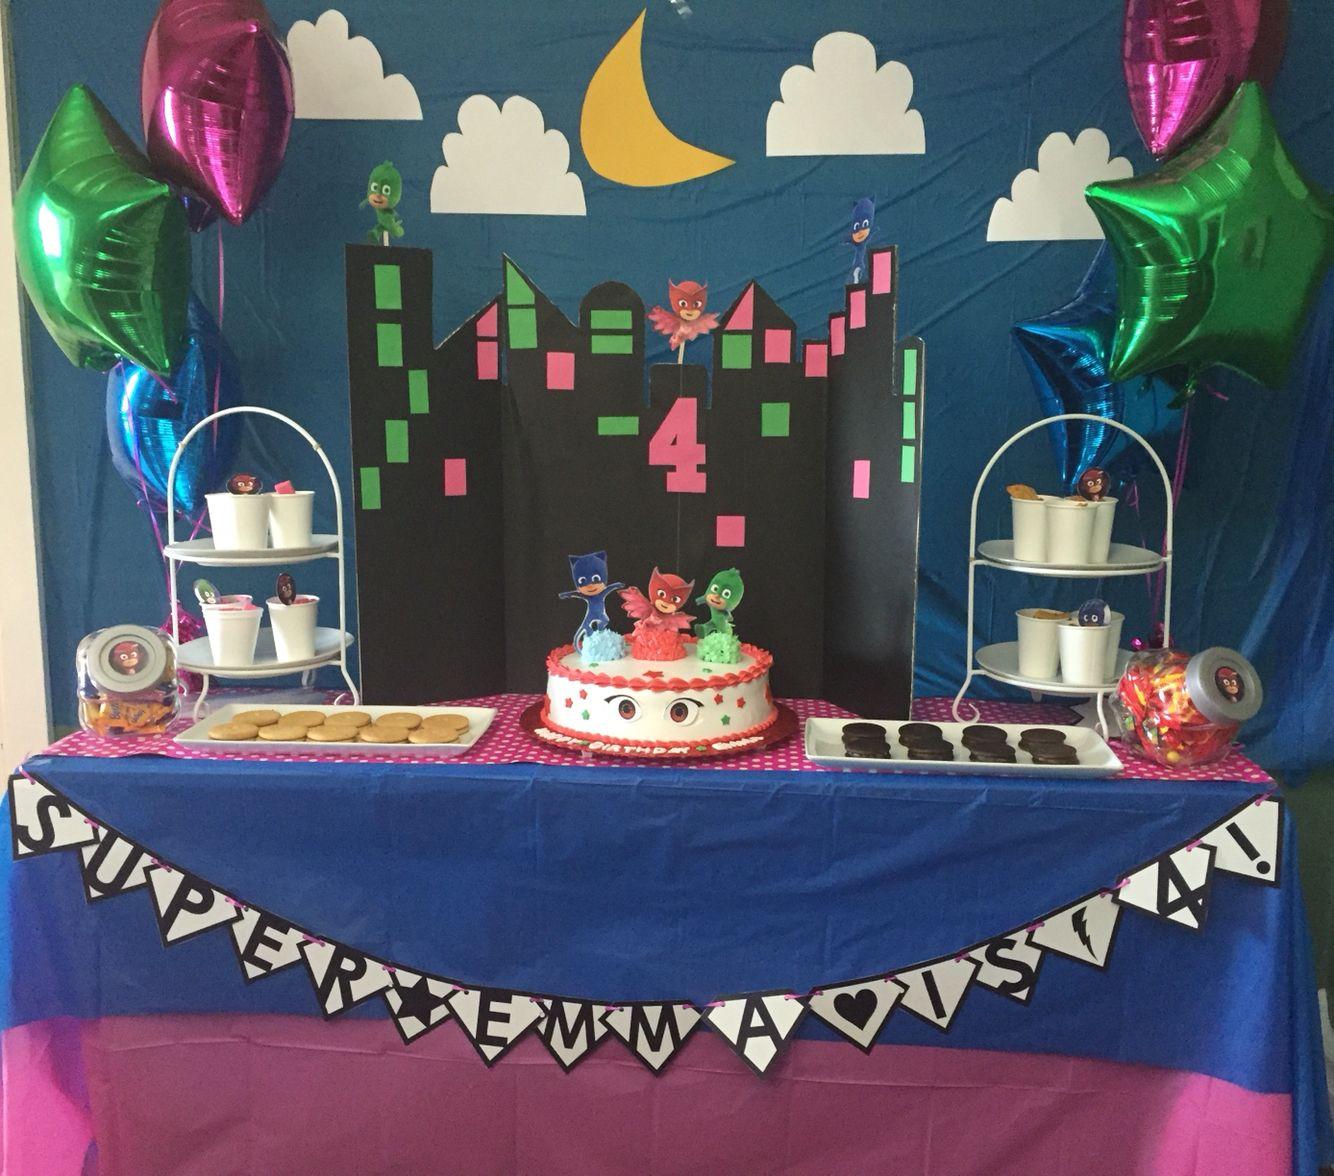 Owlette Birthday Party Decor Owlette Pjmask Owlette Birthday